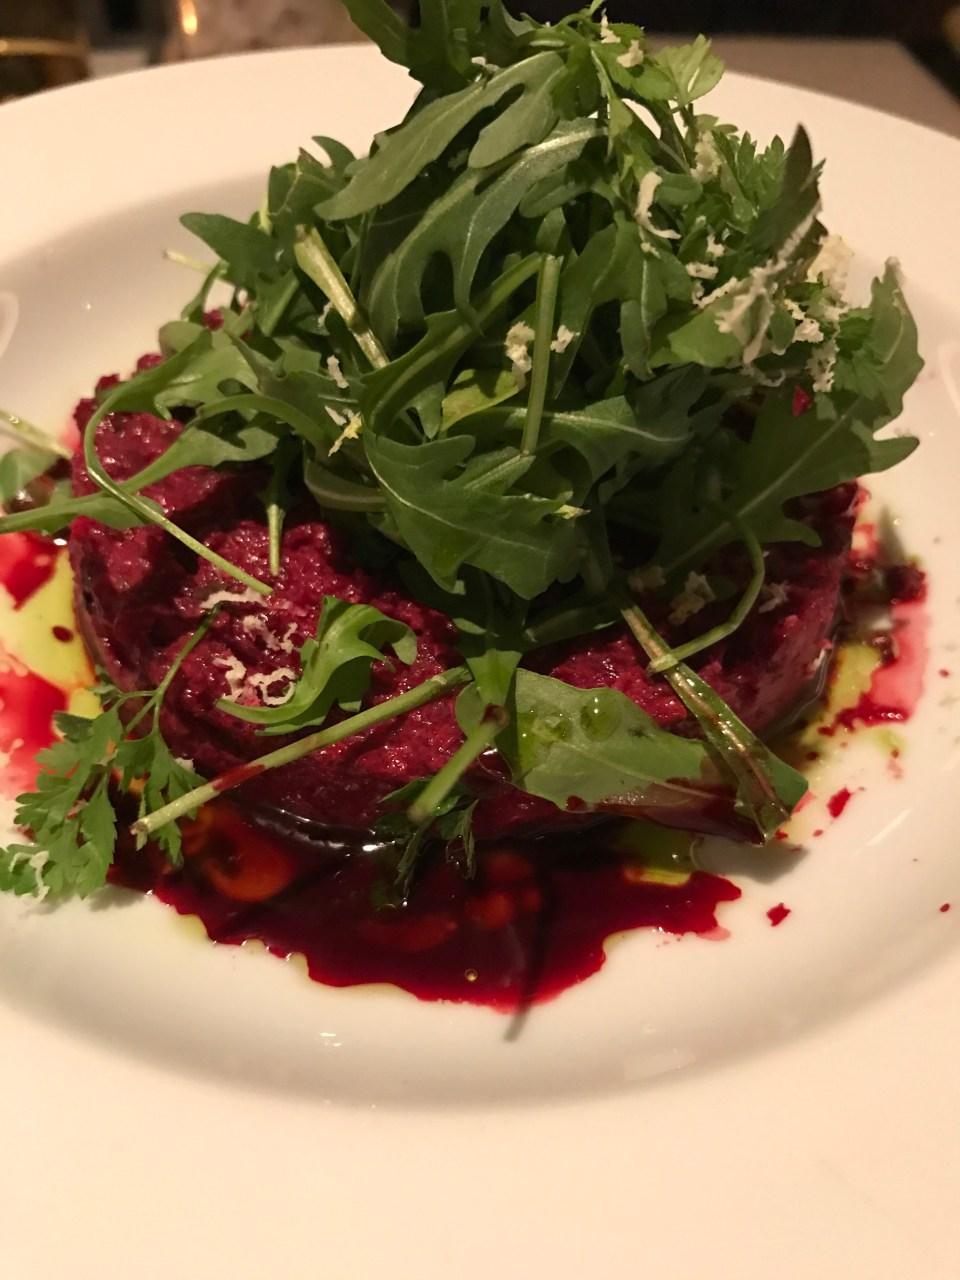 food blog qatar life on the wedge